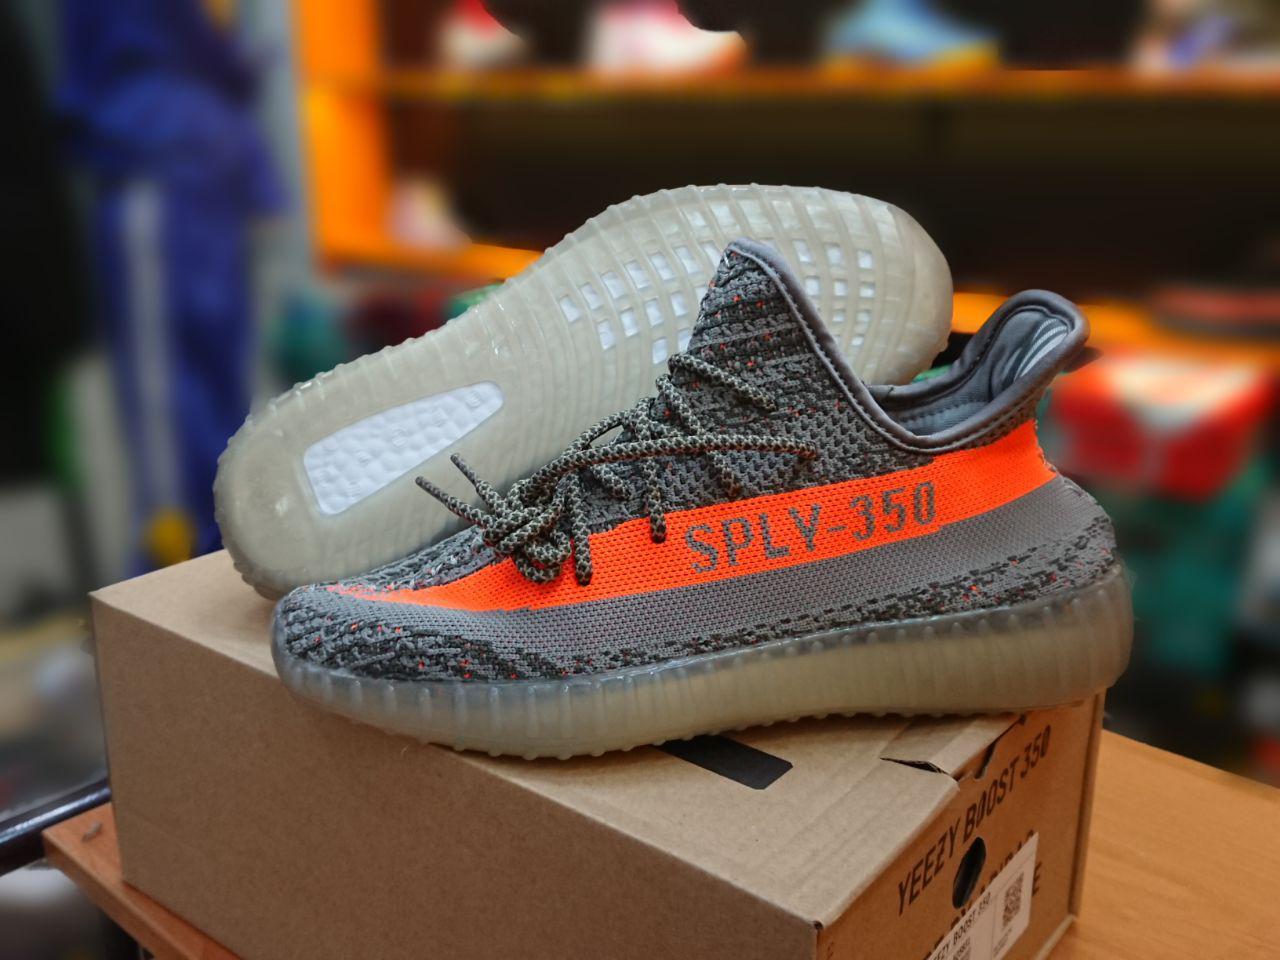 Кроссовки Adidas Yeezy Boost 350 Vol 2 by Kanye West - фото 2